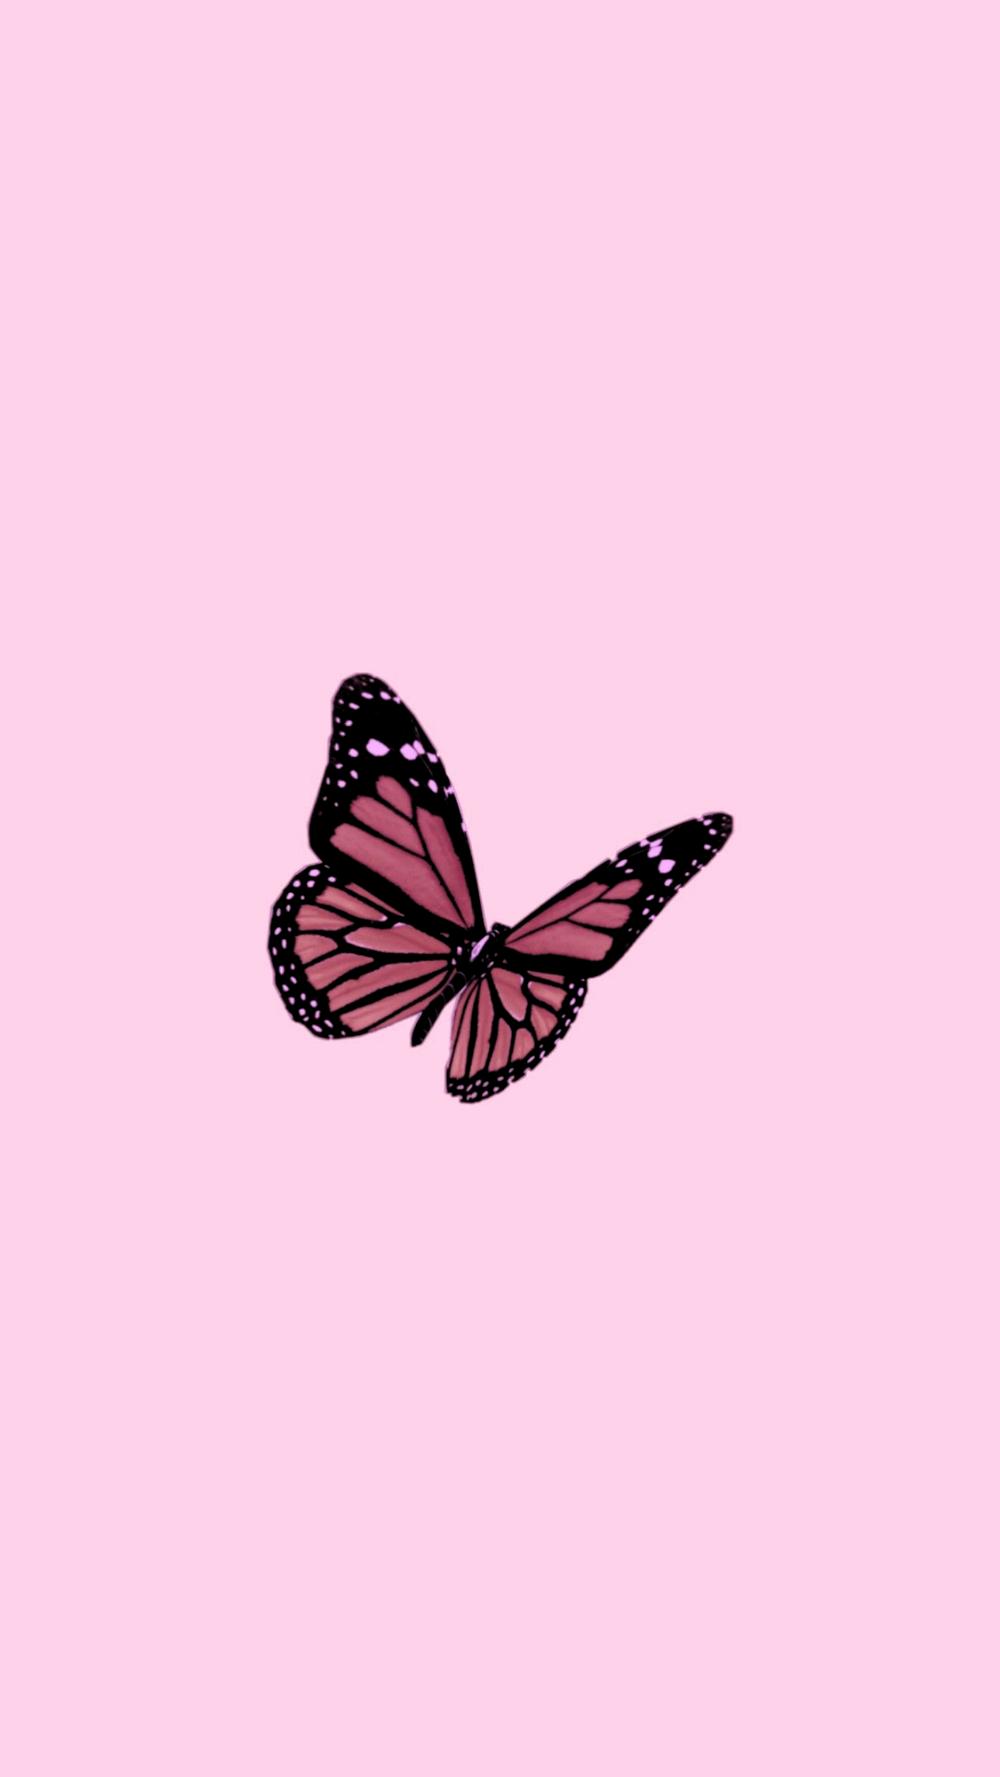 Iphone Rose Gold Aesthetic Tumblr Iphone Rose Gold Butterfly Wallpaper 686658274422981736 Butterfly Wallpaper Rose Gold Aesthetic Butterfly Wallpaper Iphone